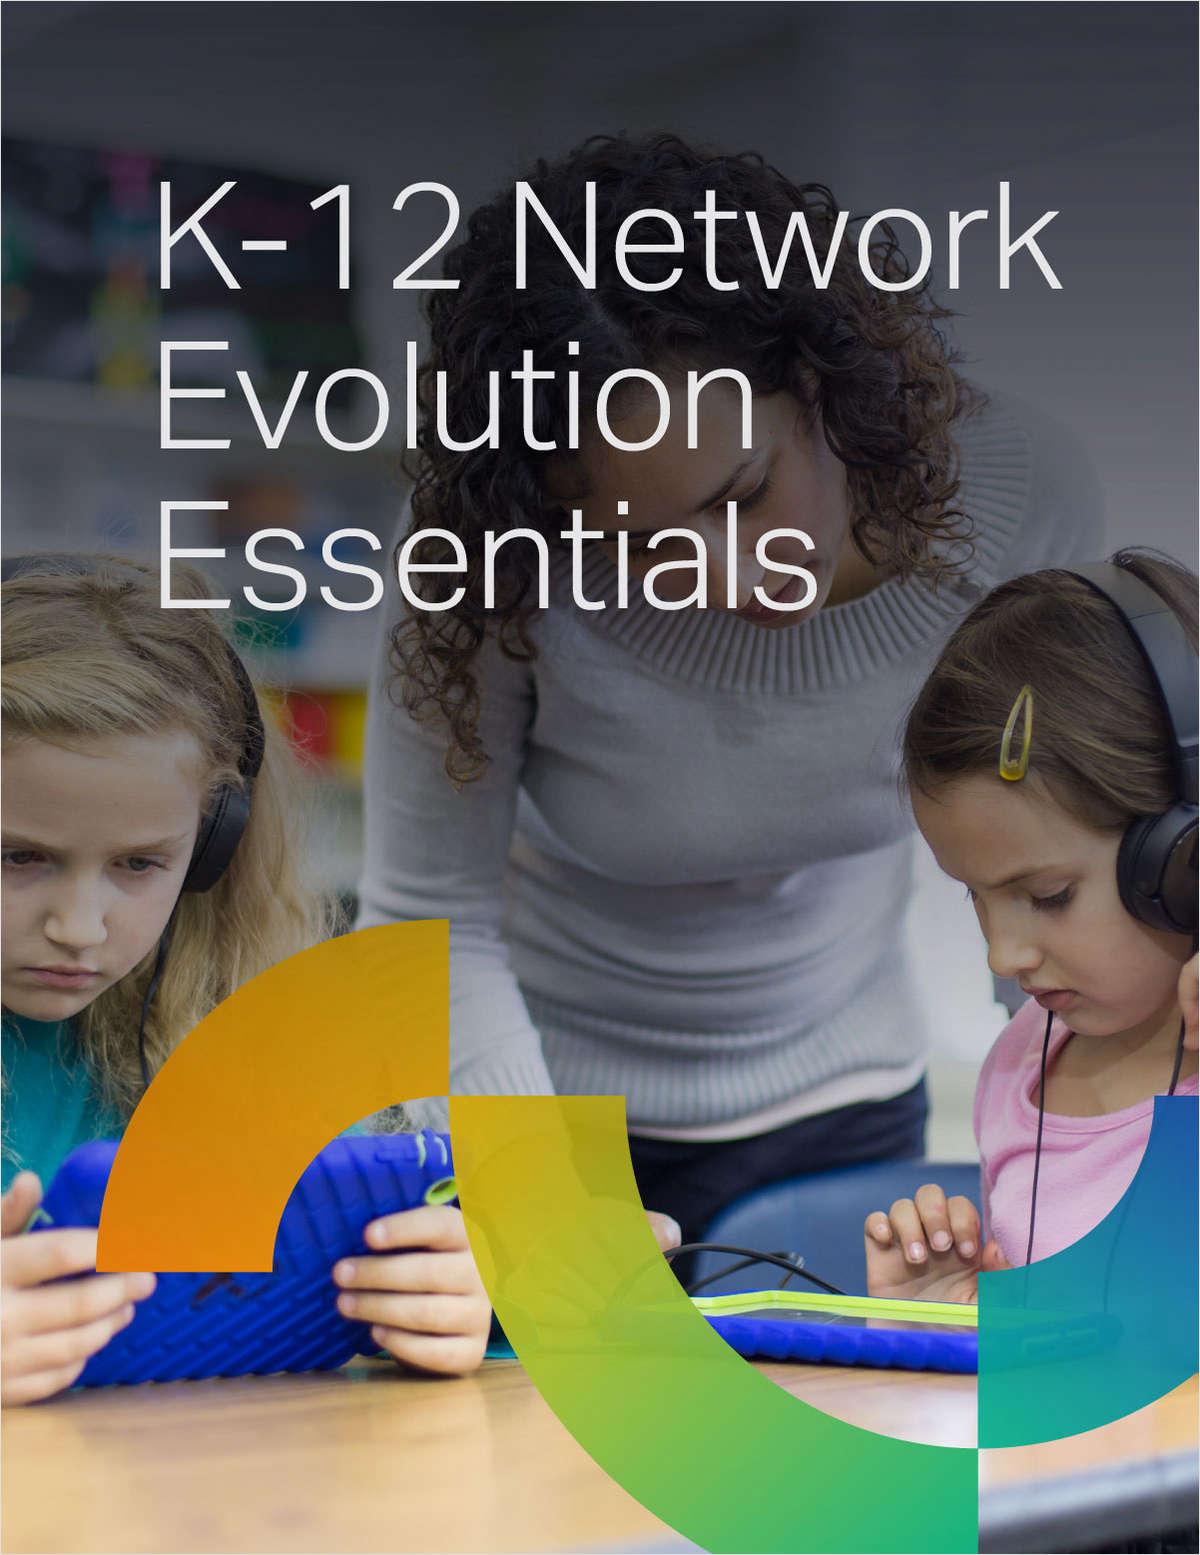 K-12 Network Evolution Essentials: Paving the Digital Highway